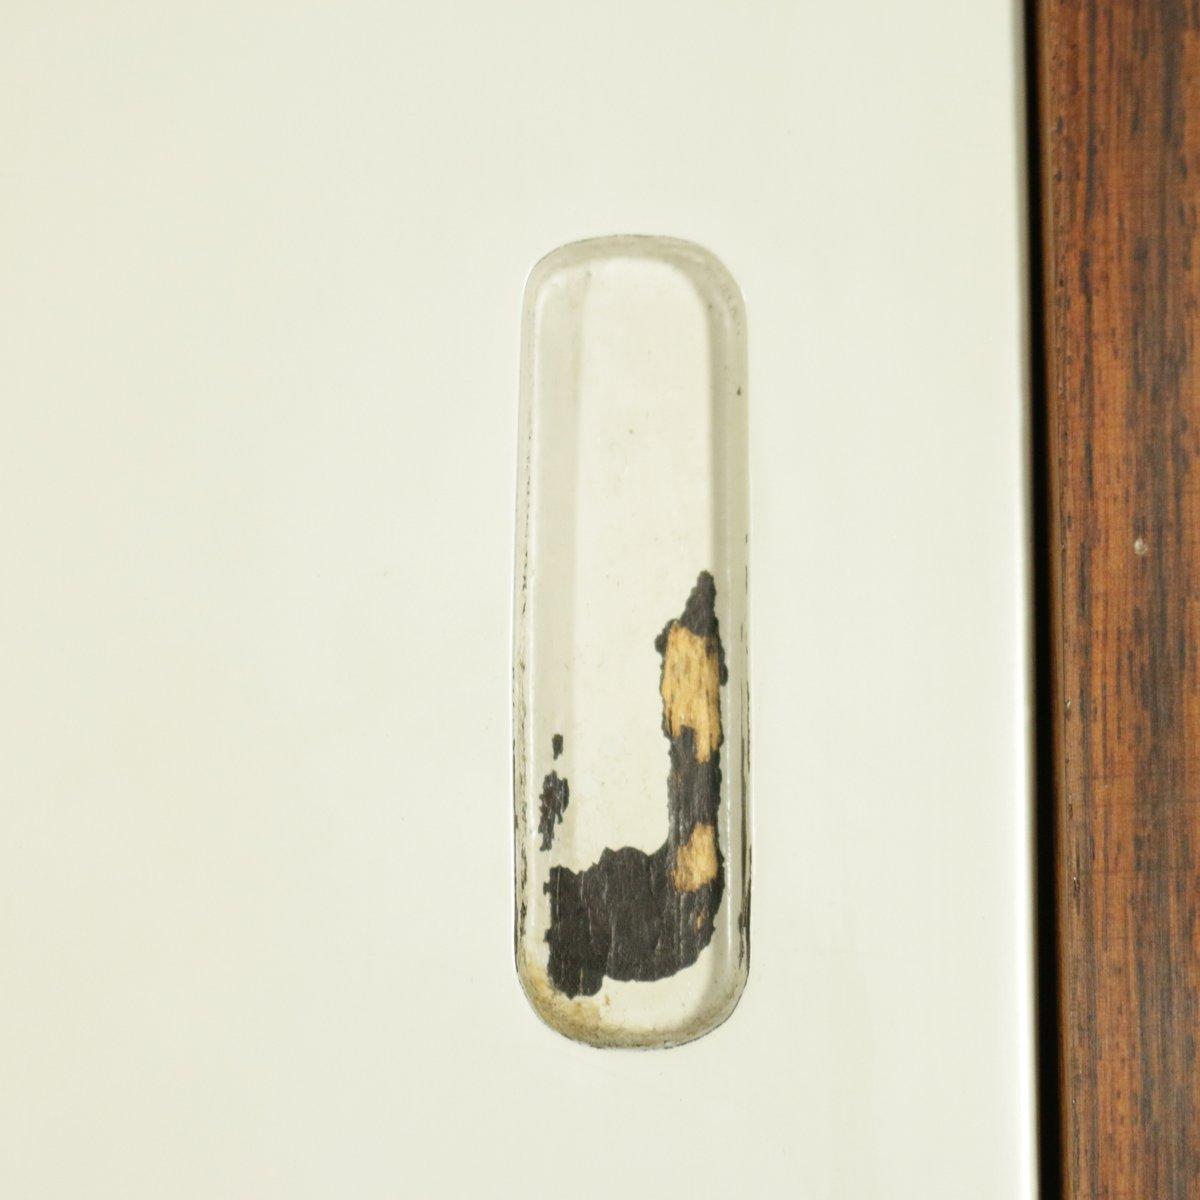 b cherregal aus palisander furnier messing metall 1960er bei pamono kaufen. Black Bedroom Furniture Sets. Home Design Ideas